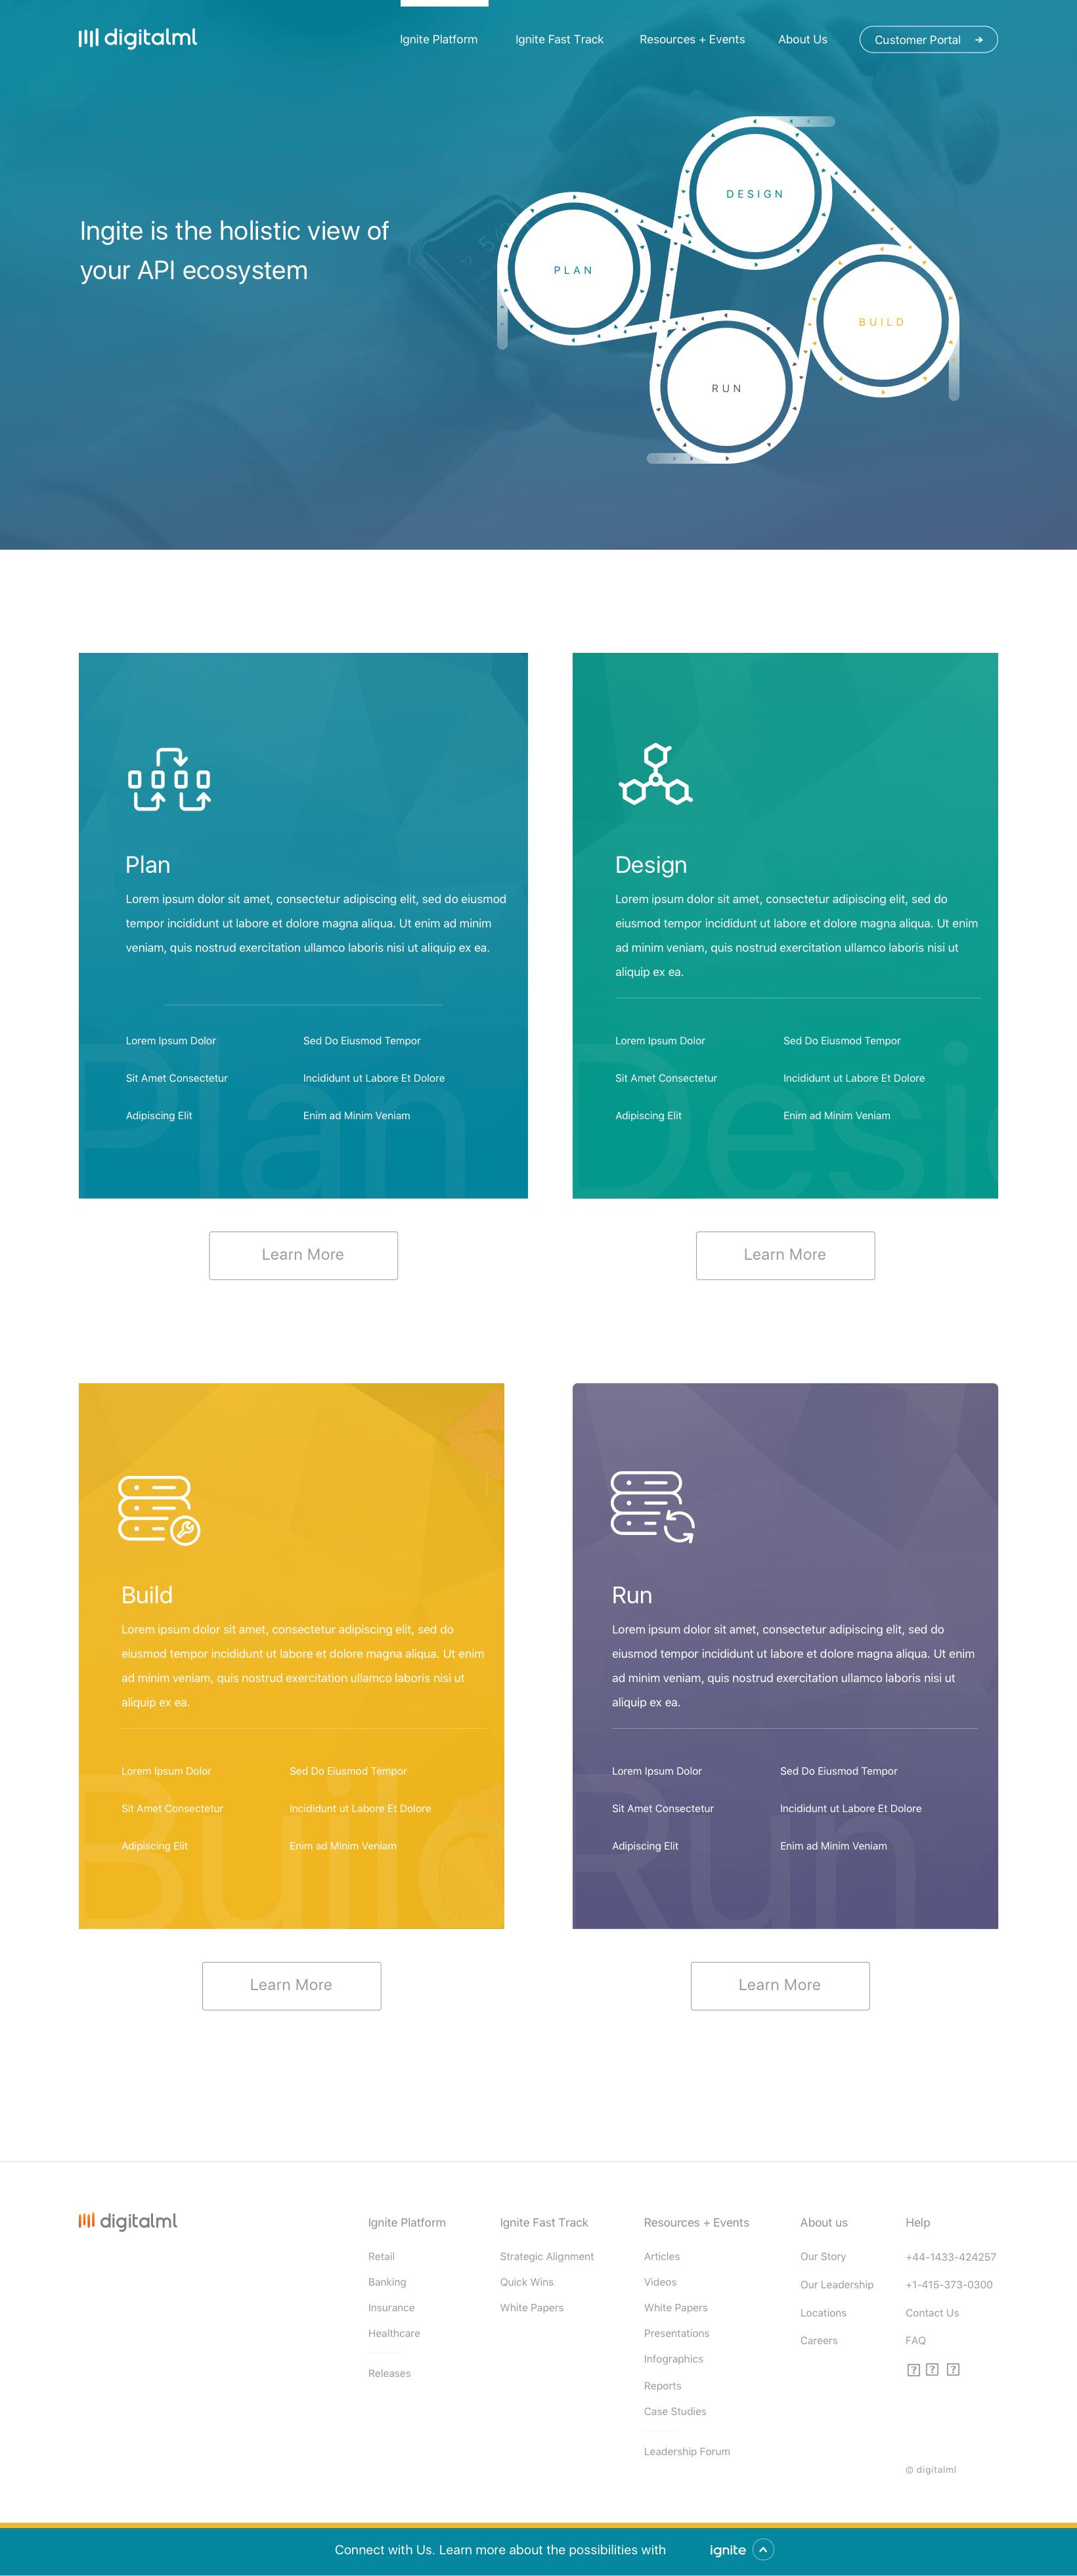 digitalml - ignite Platform Page.png